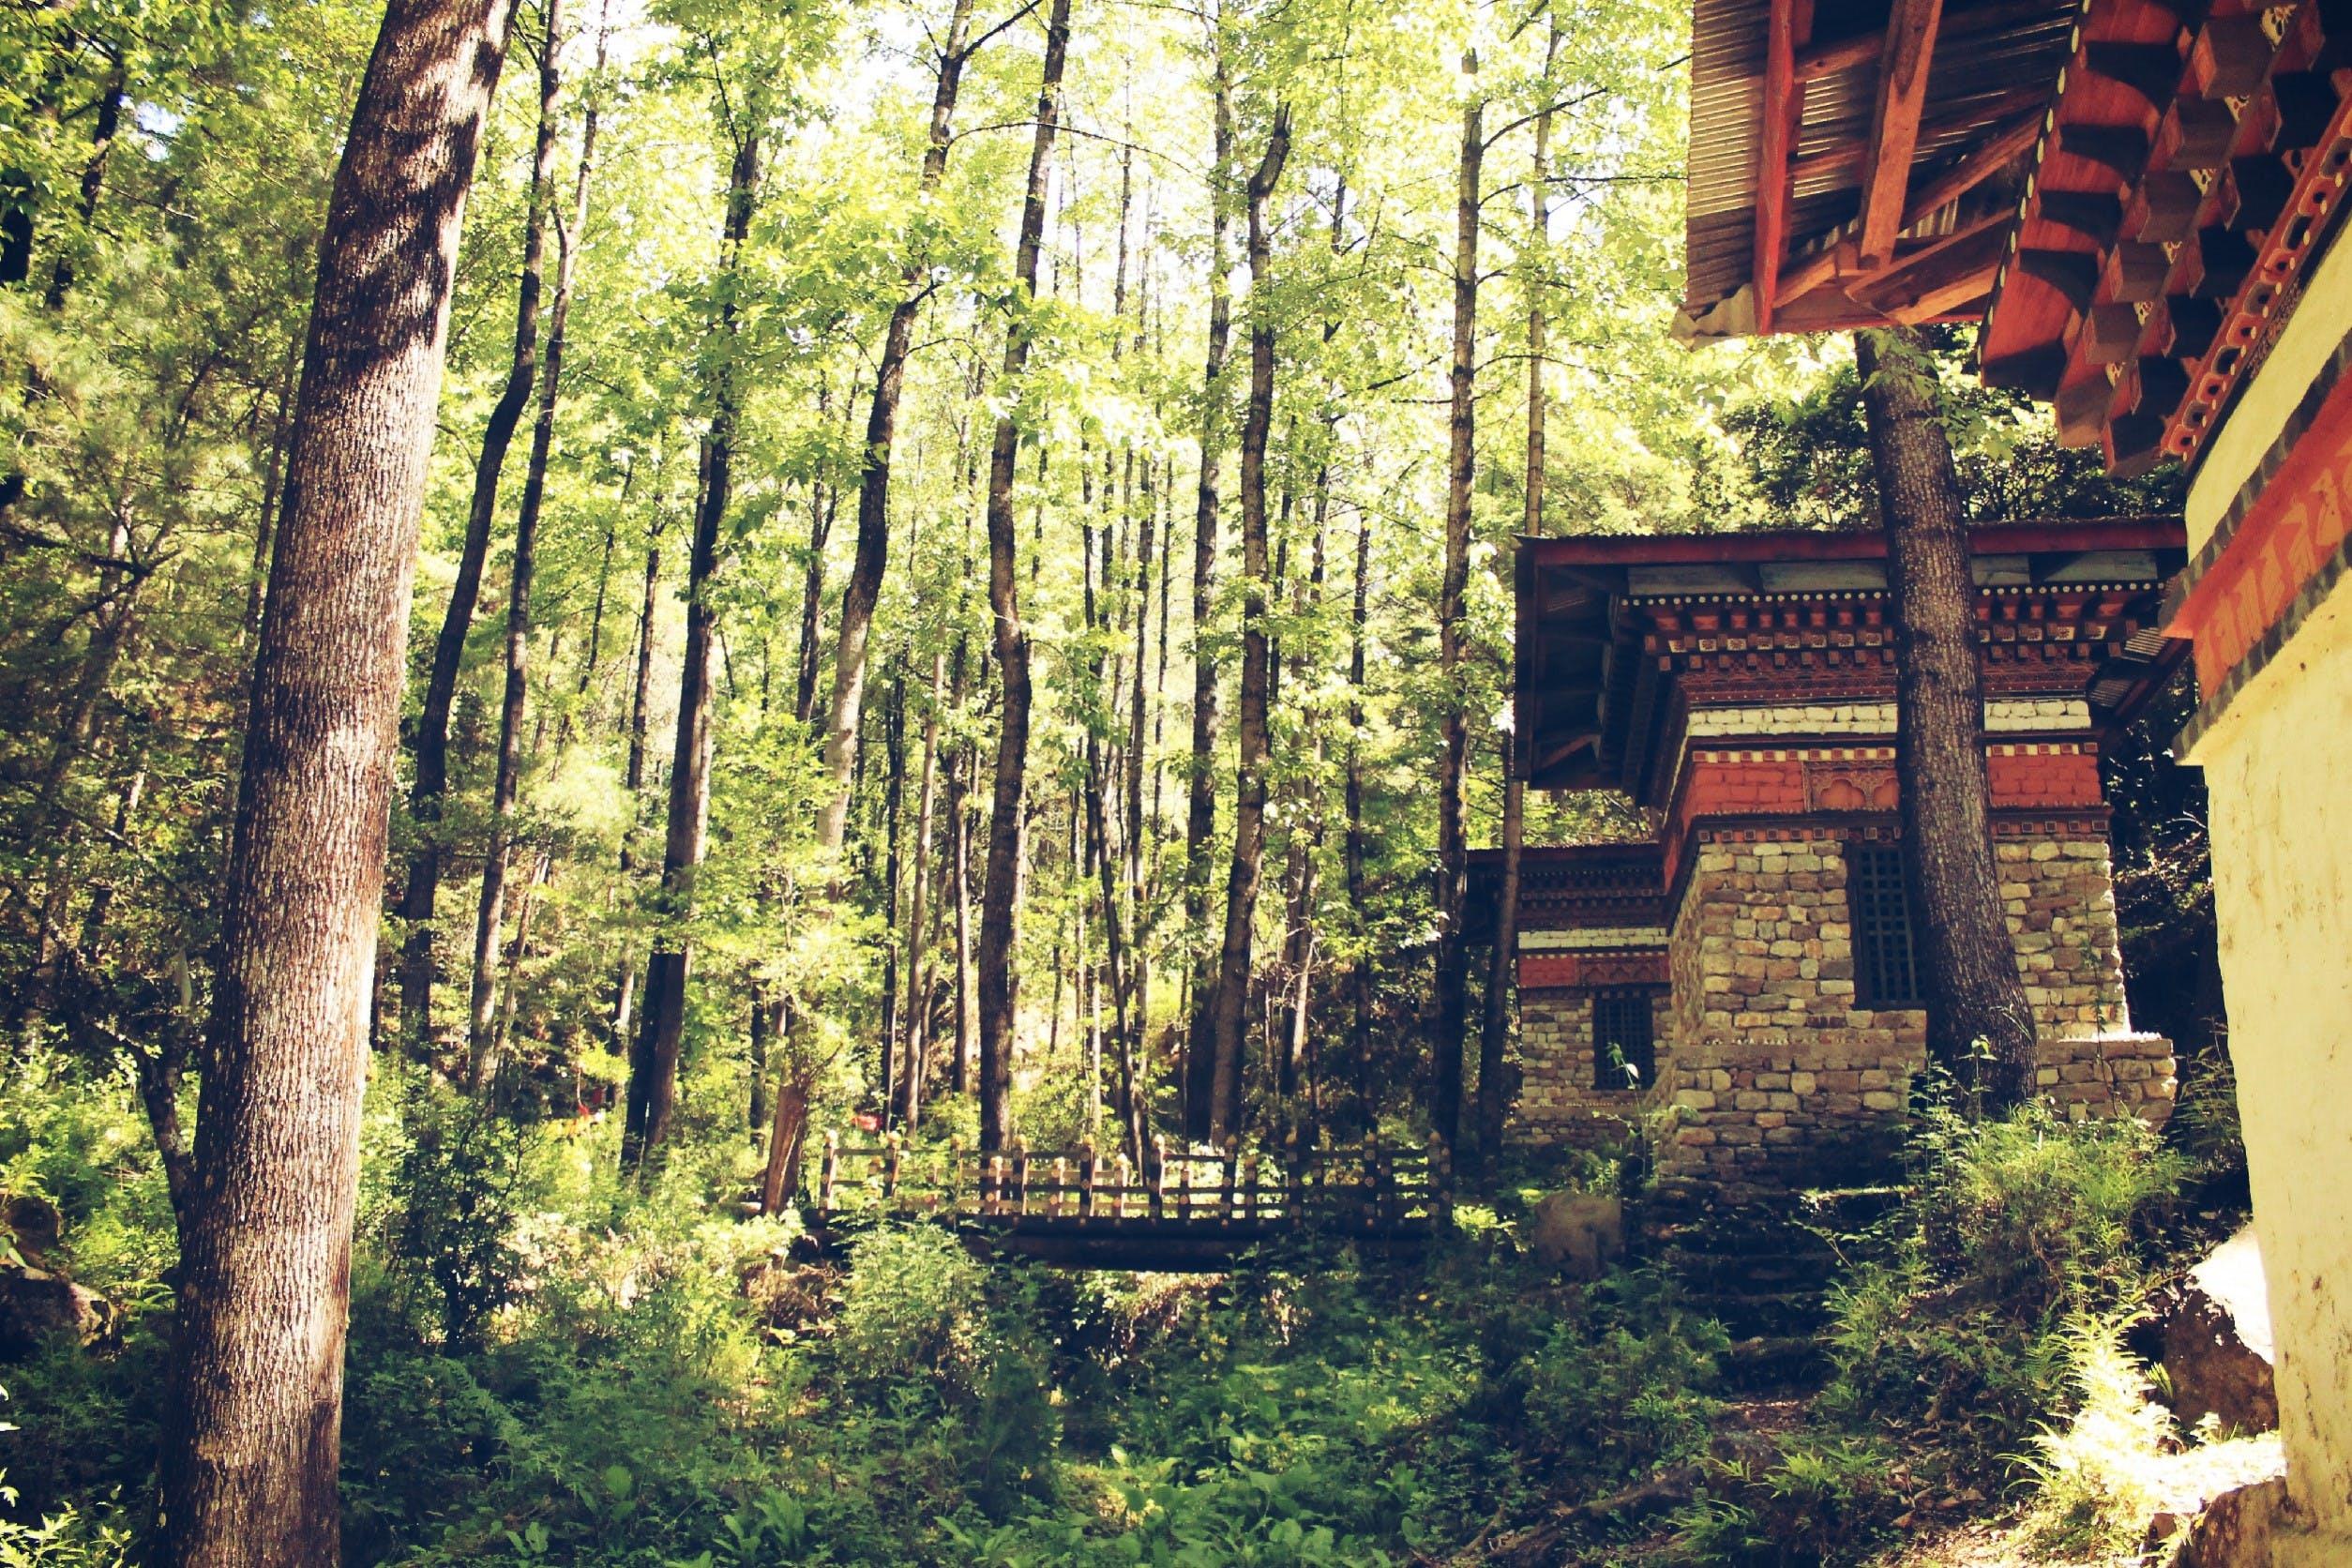 Kostenloses Stock Foto zu landschaft, häuser, felsen, wald